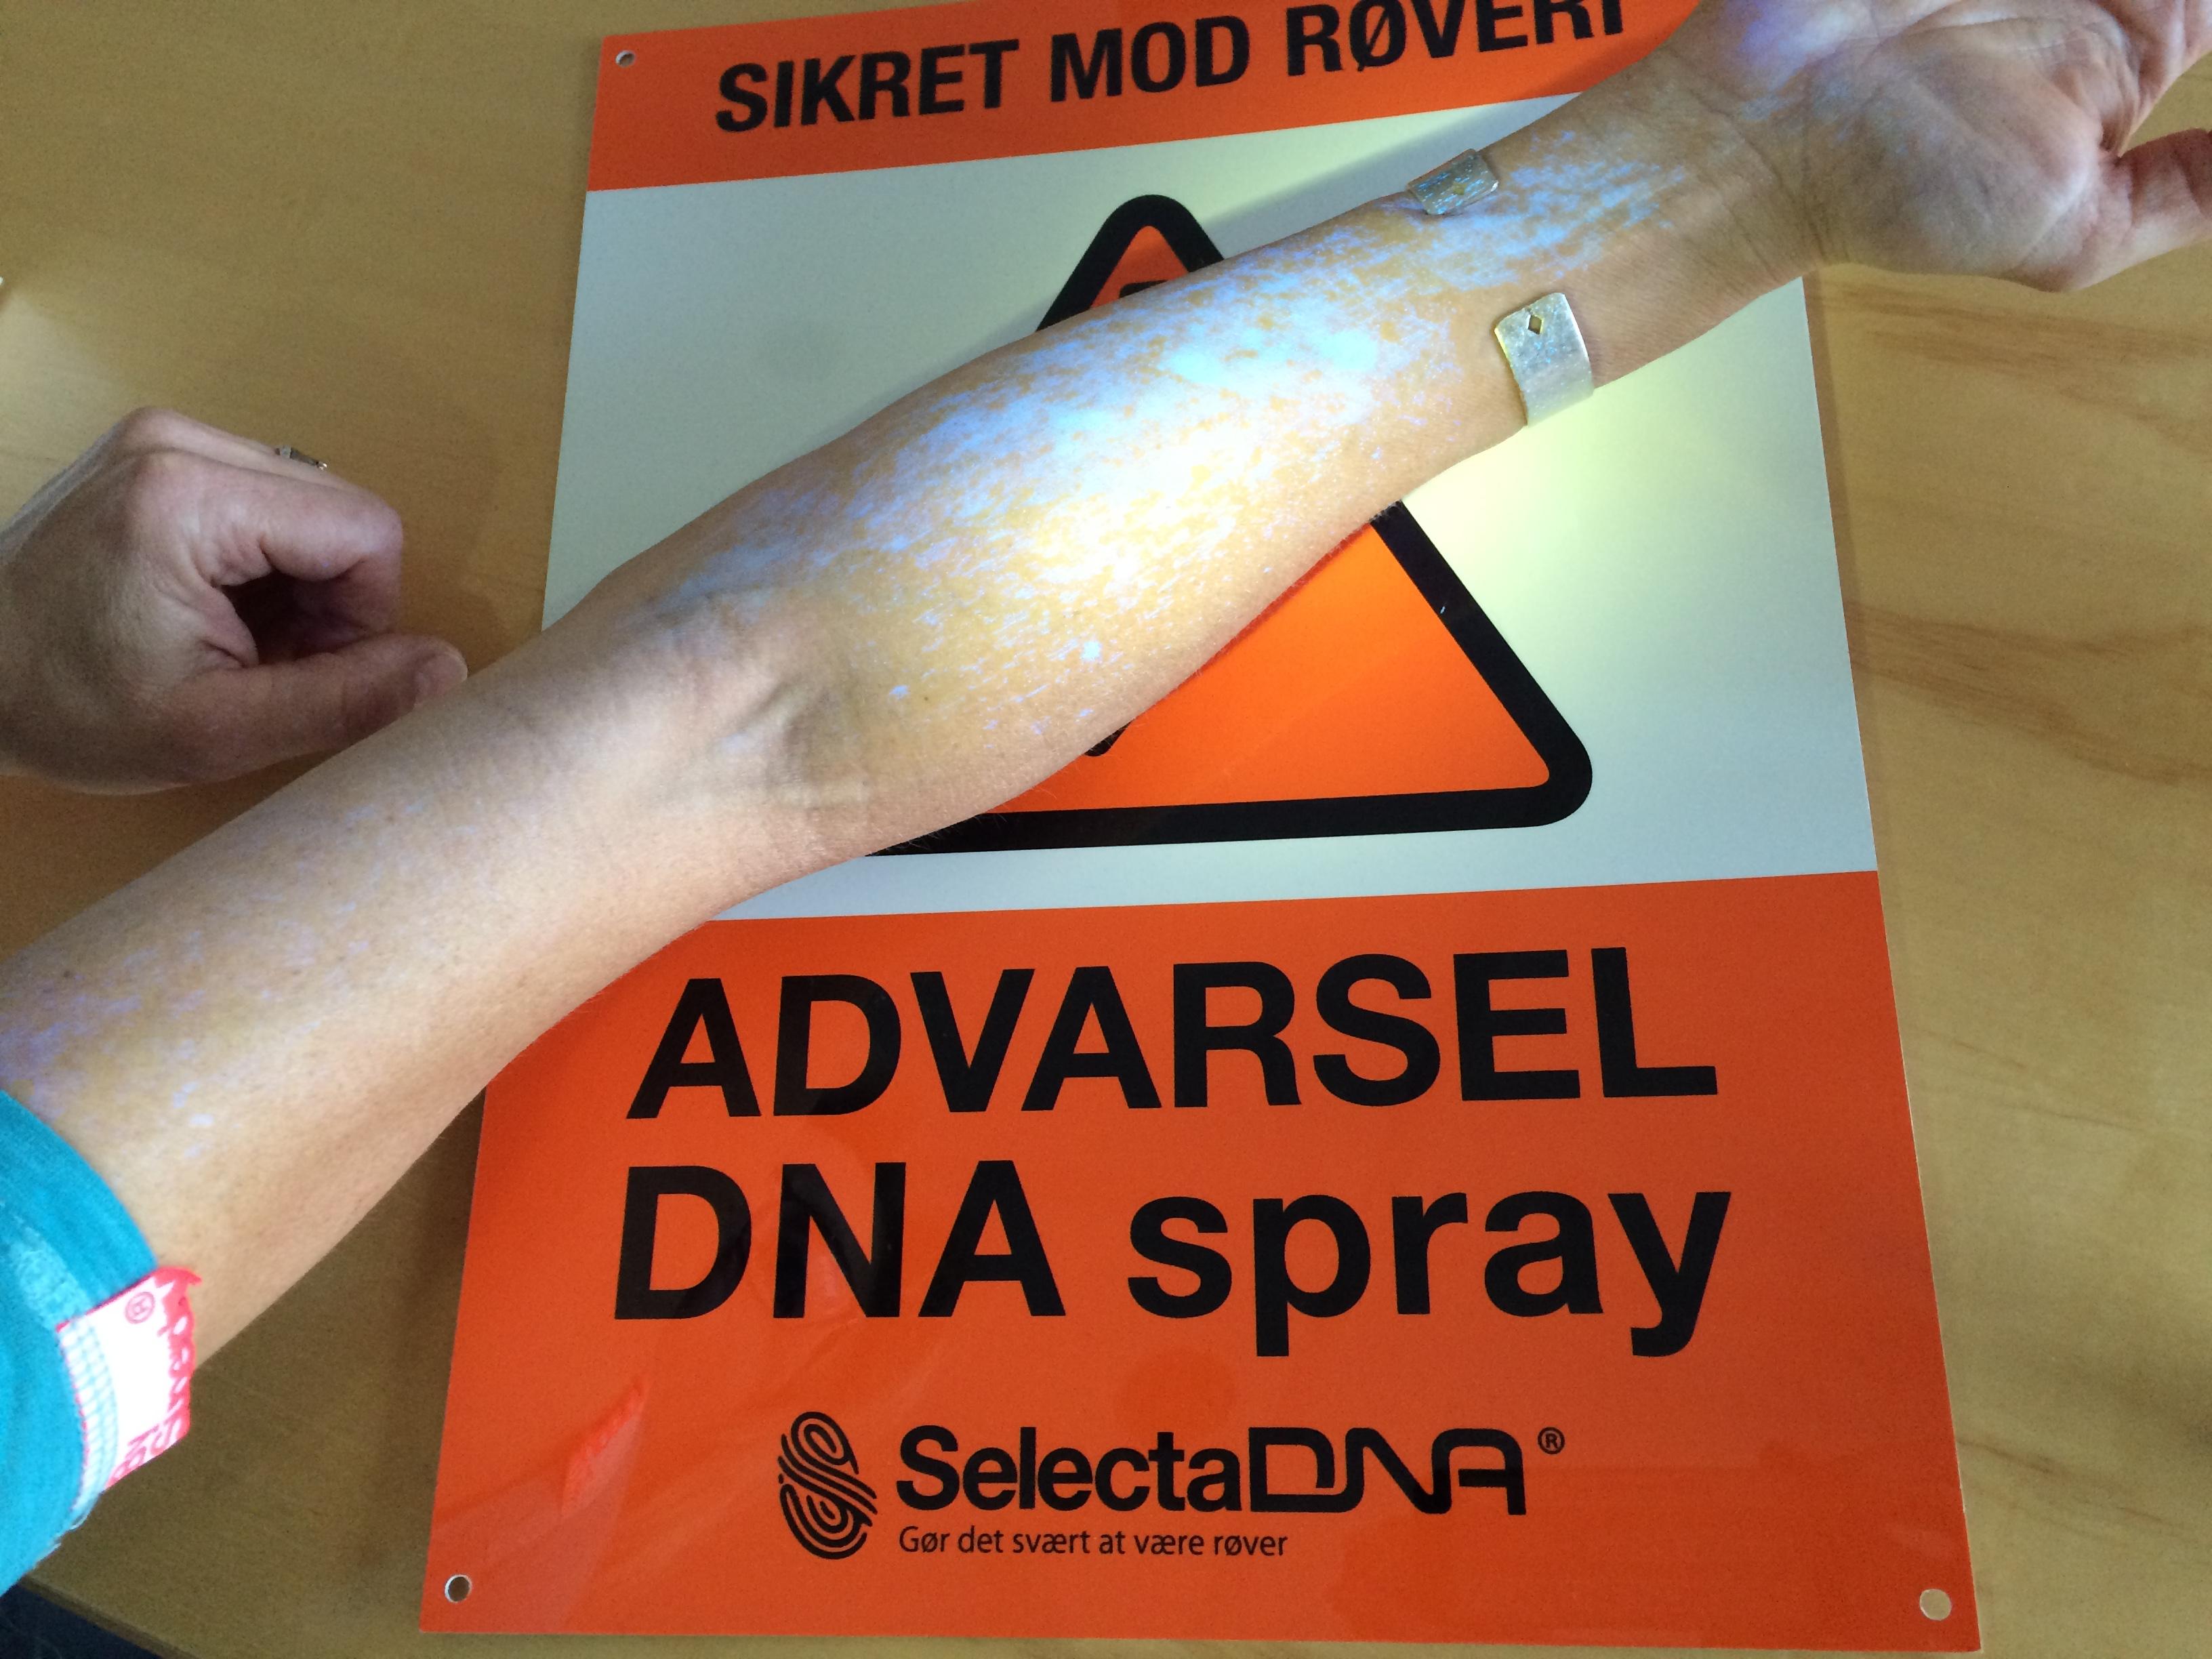 dna-spray.jpg